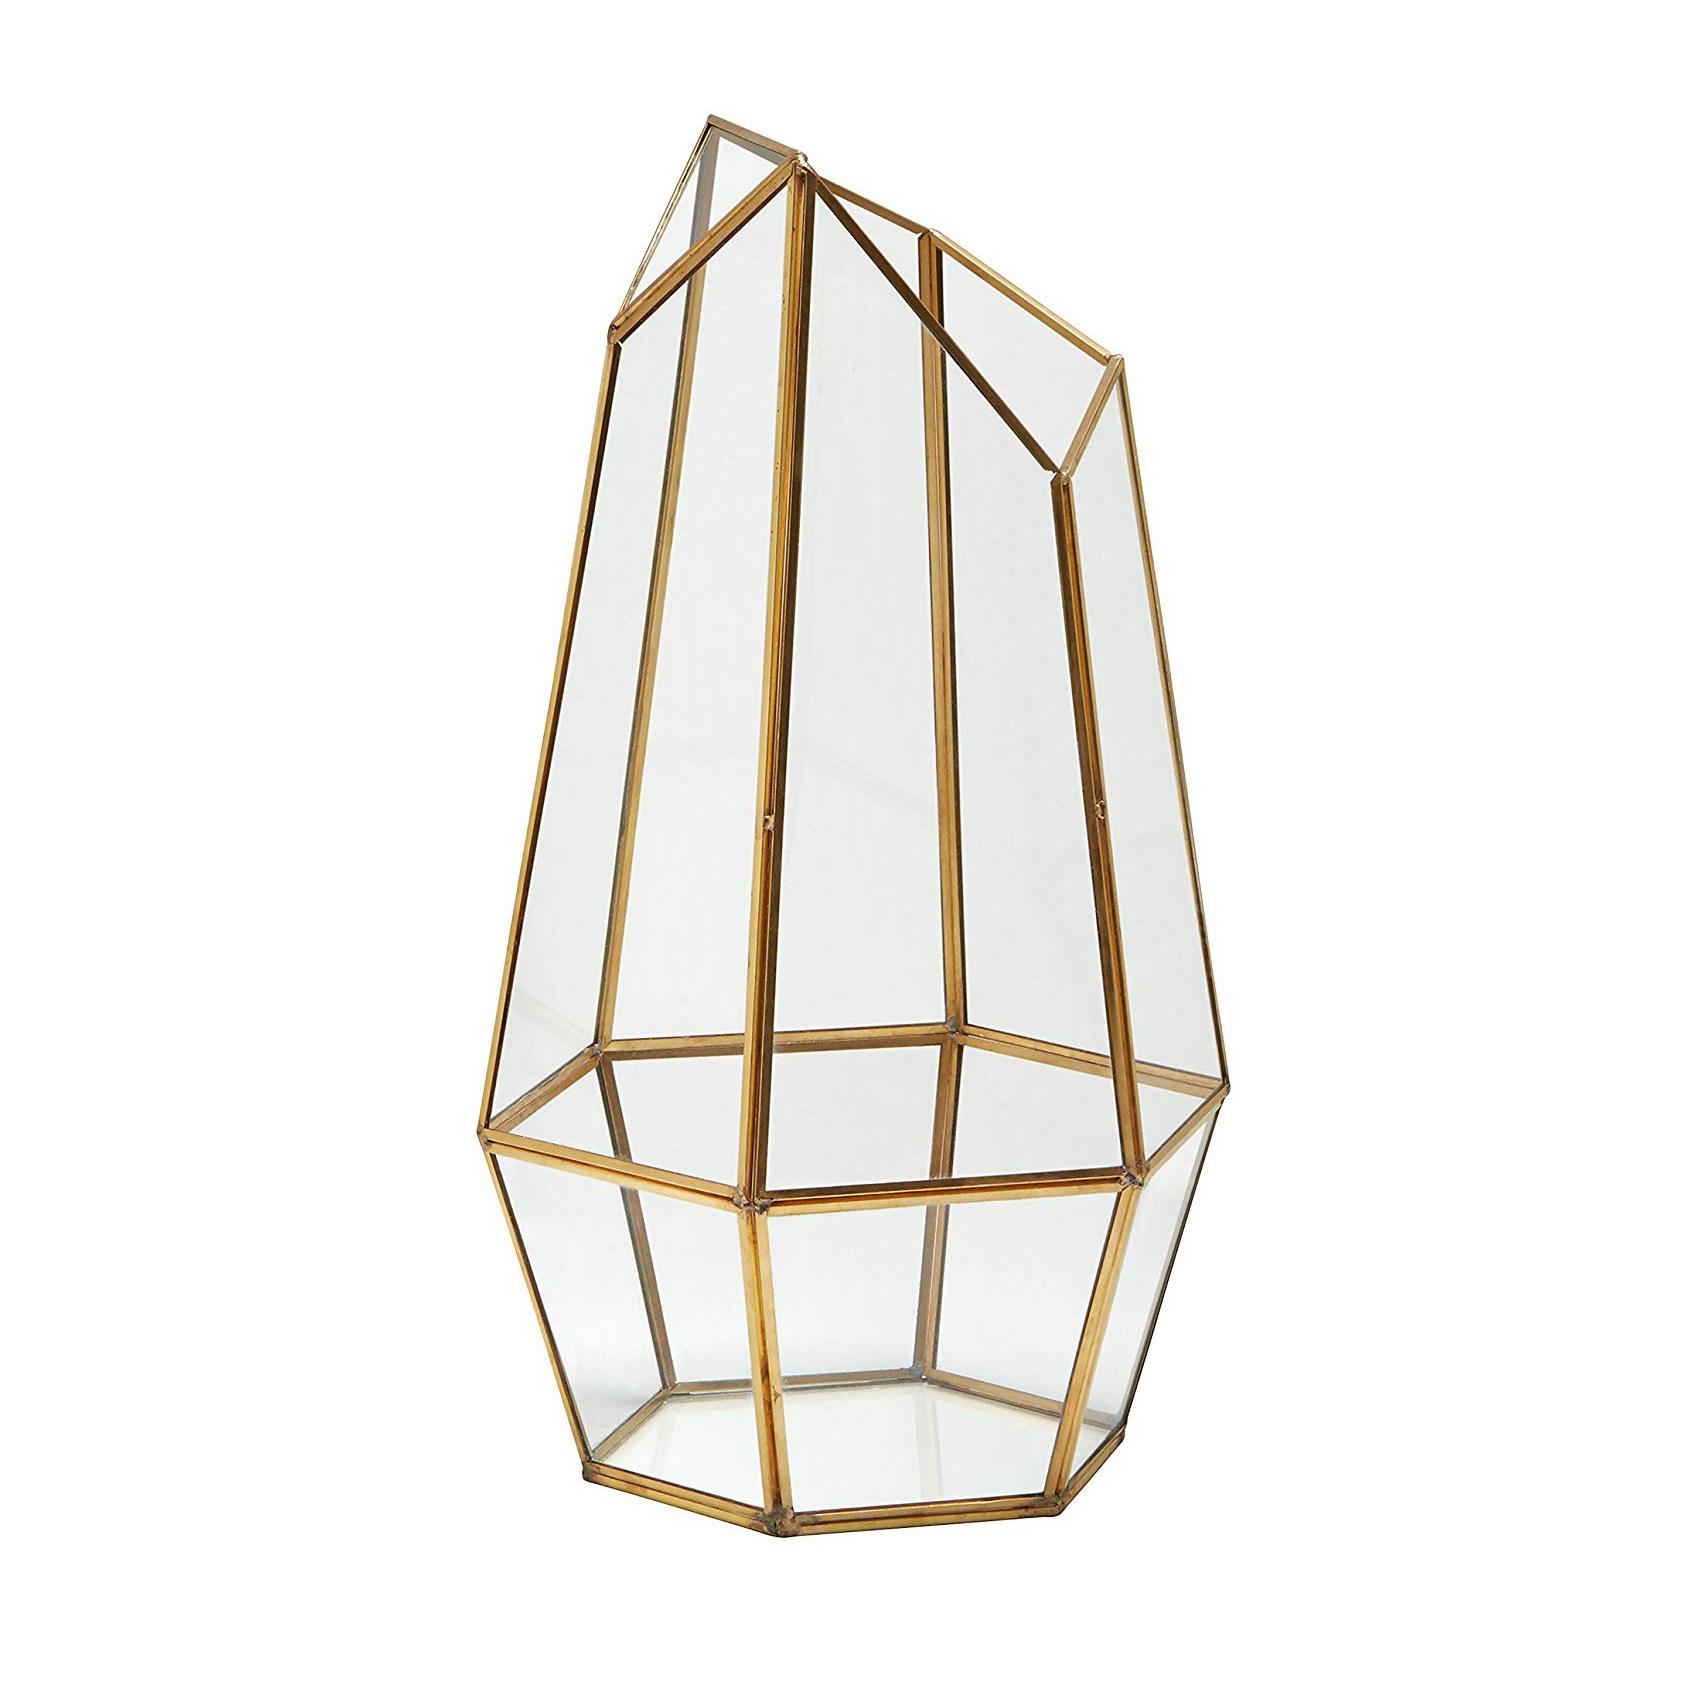 geometric glass candle holder, boho-chic home decor